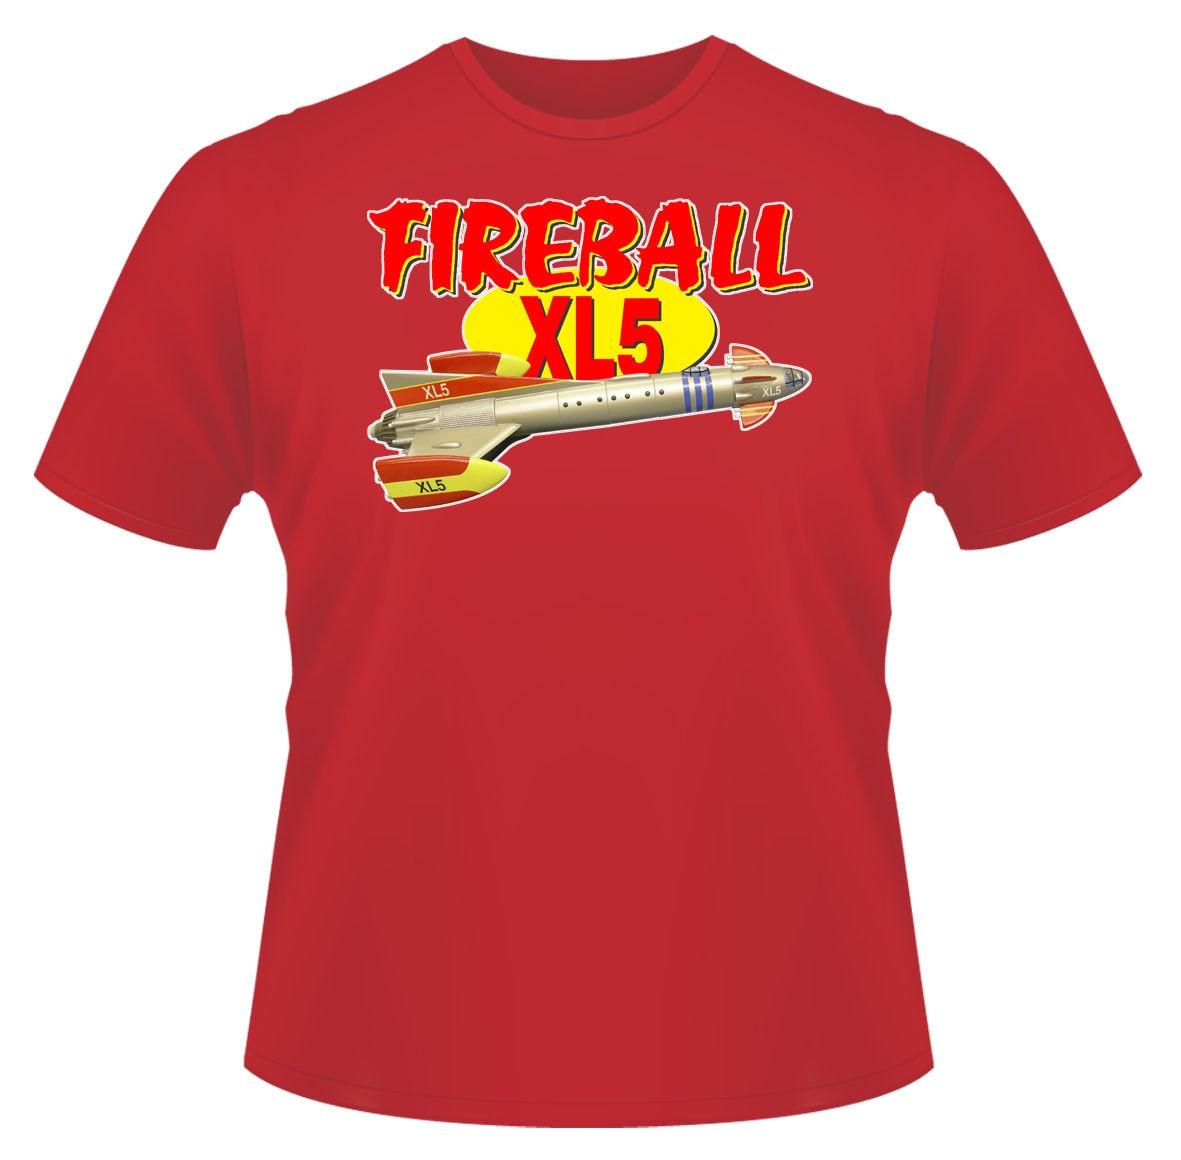 Gildan Fireball XL5, Gift, Birthday Present